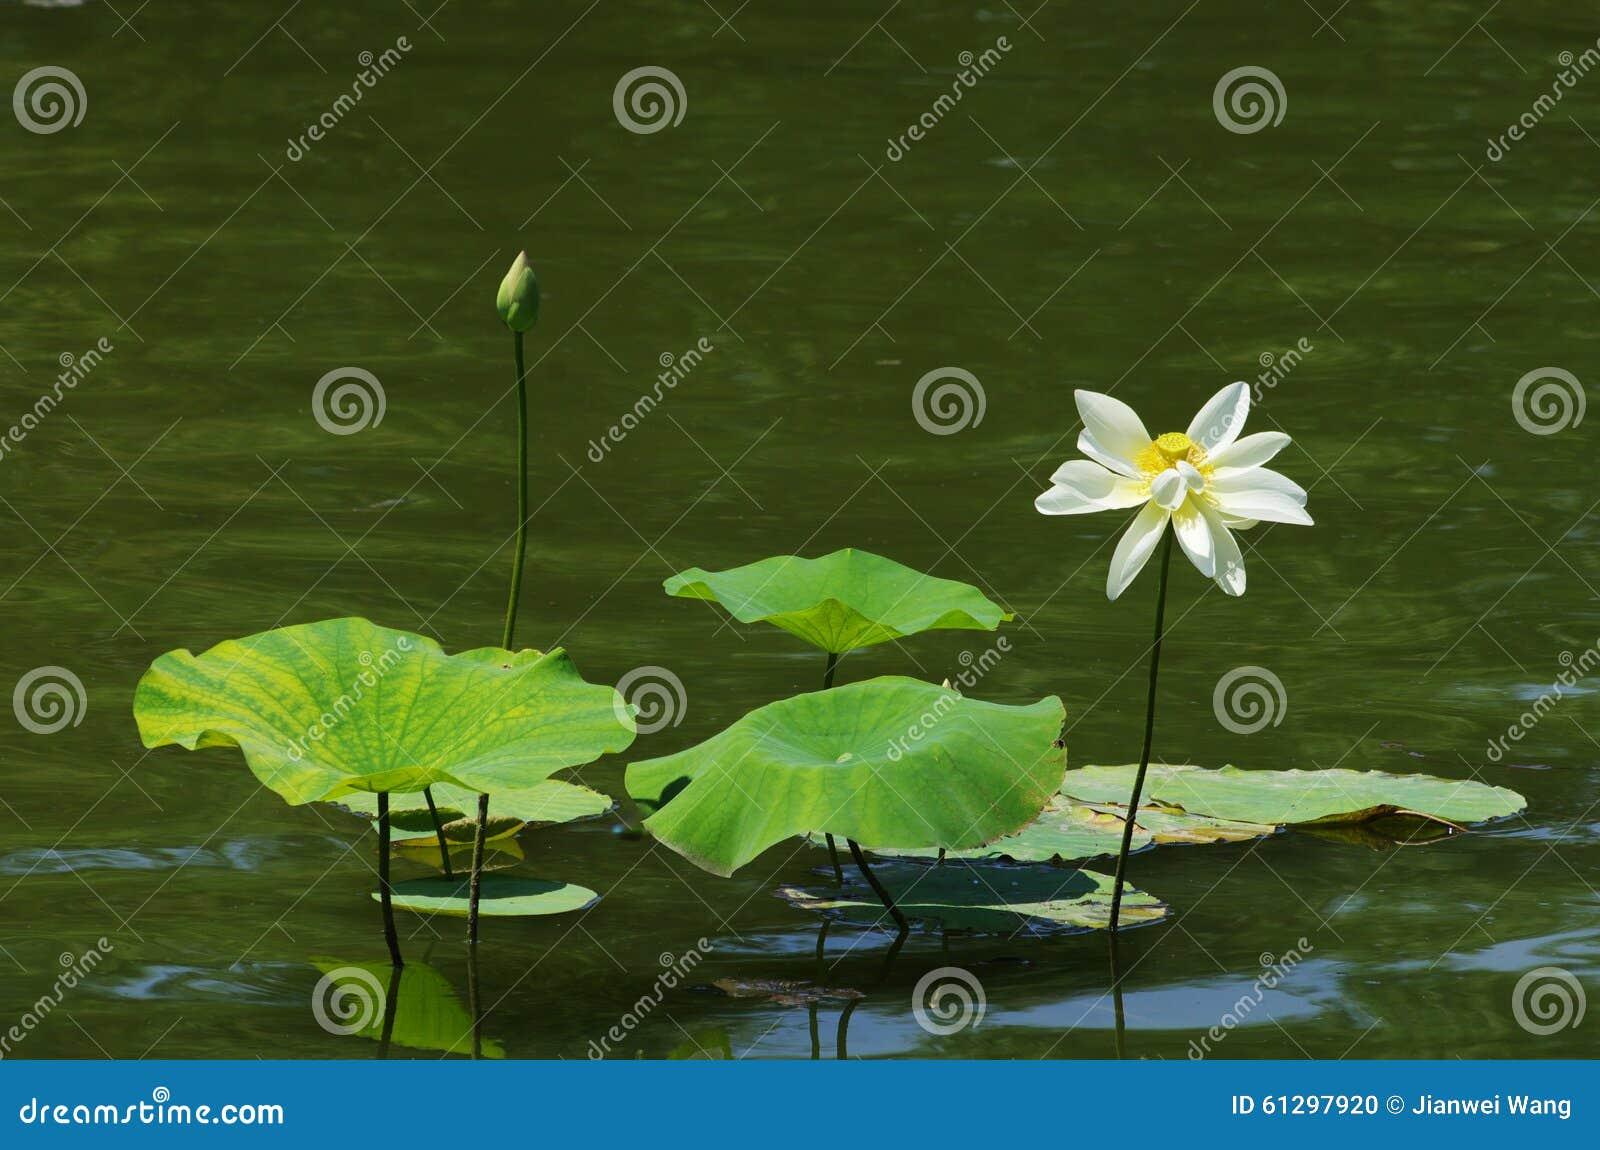 White Lotus Flower Stock Photo Cartoondealer Com 61297920